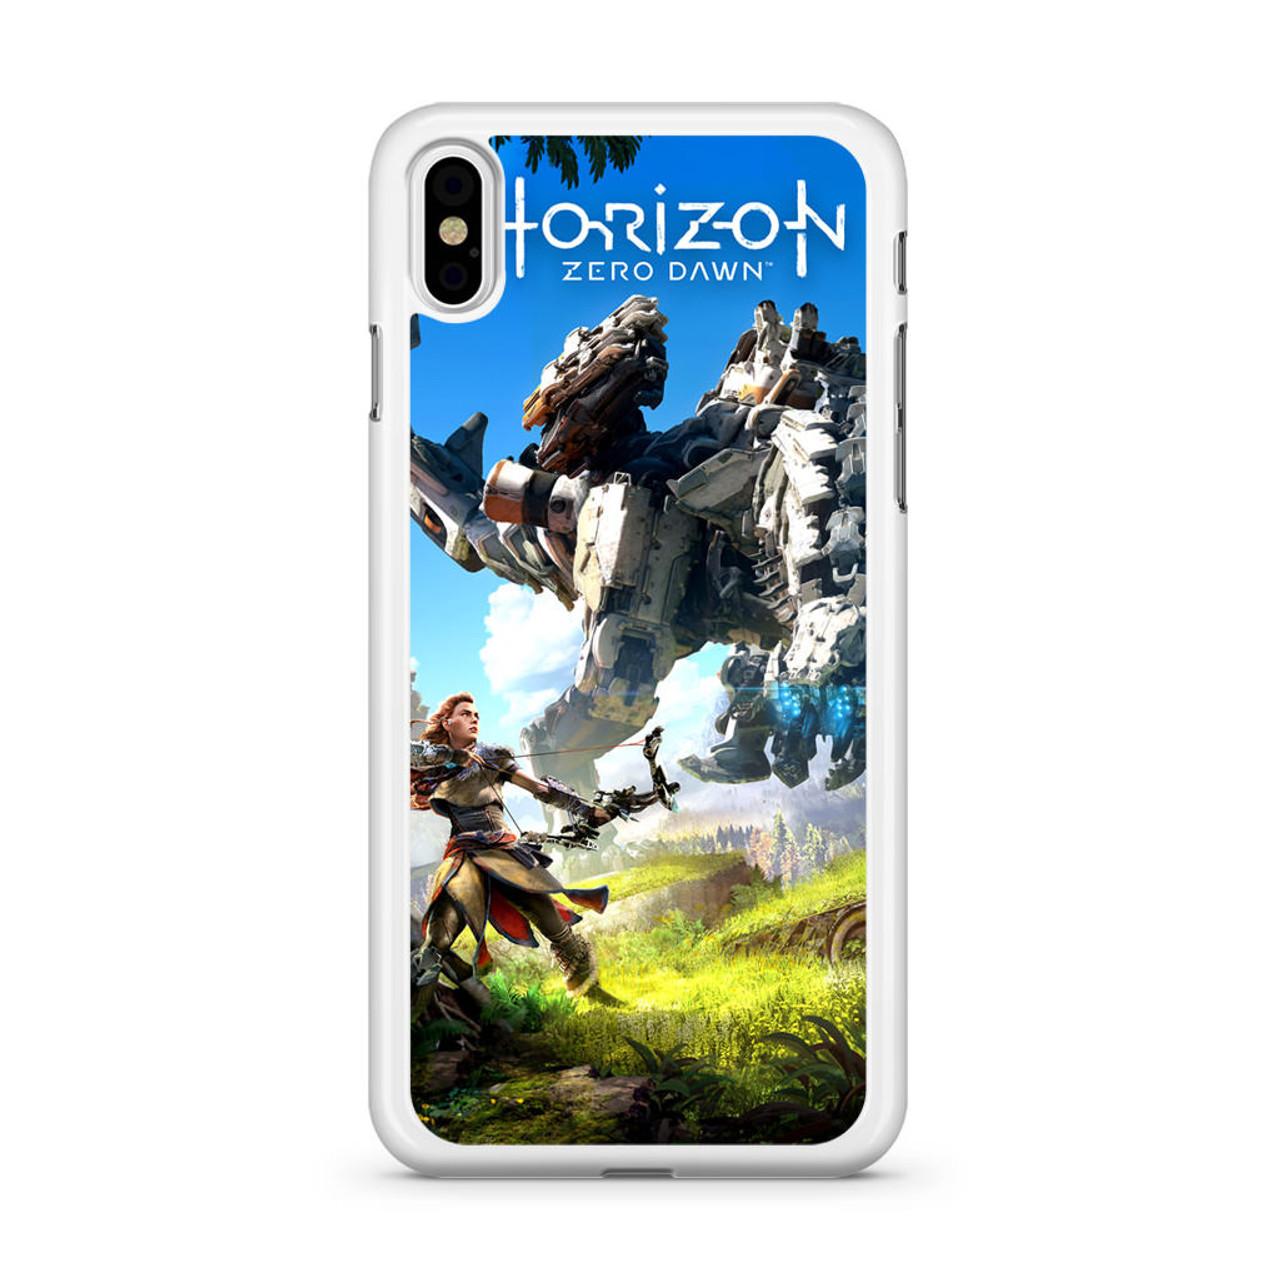 Horizon Zero Dawn Wallpaper Iphone Xs Max Case Jocases